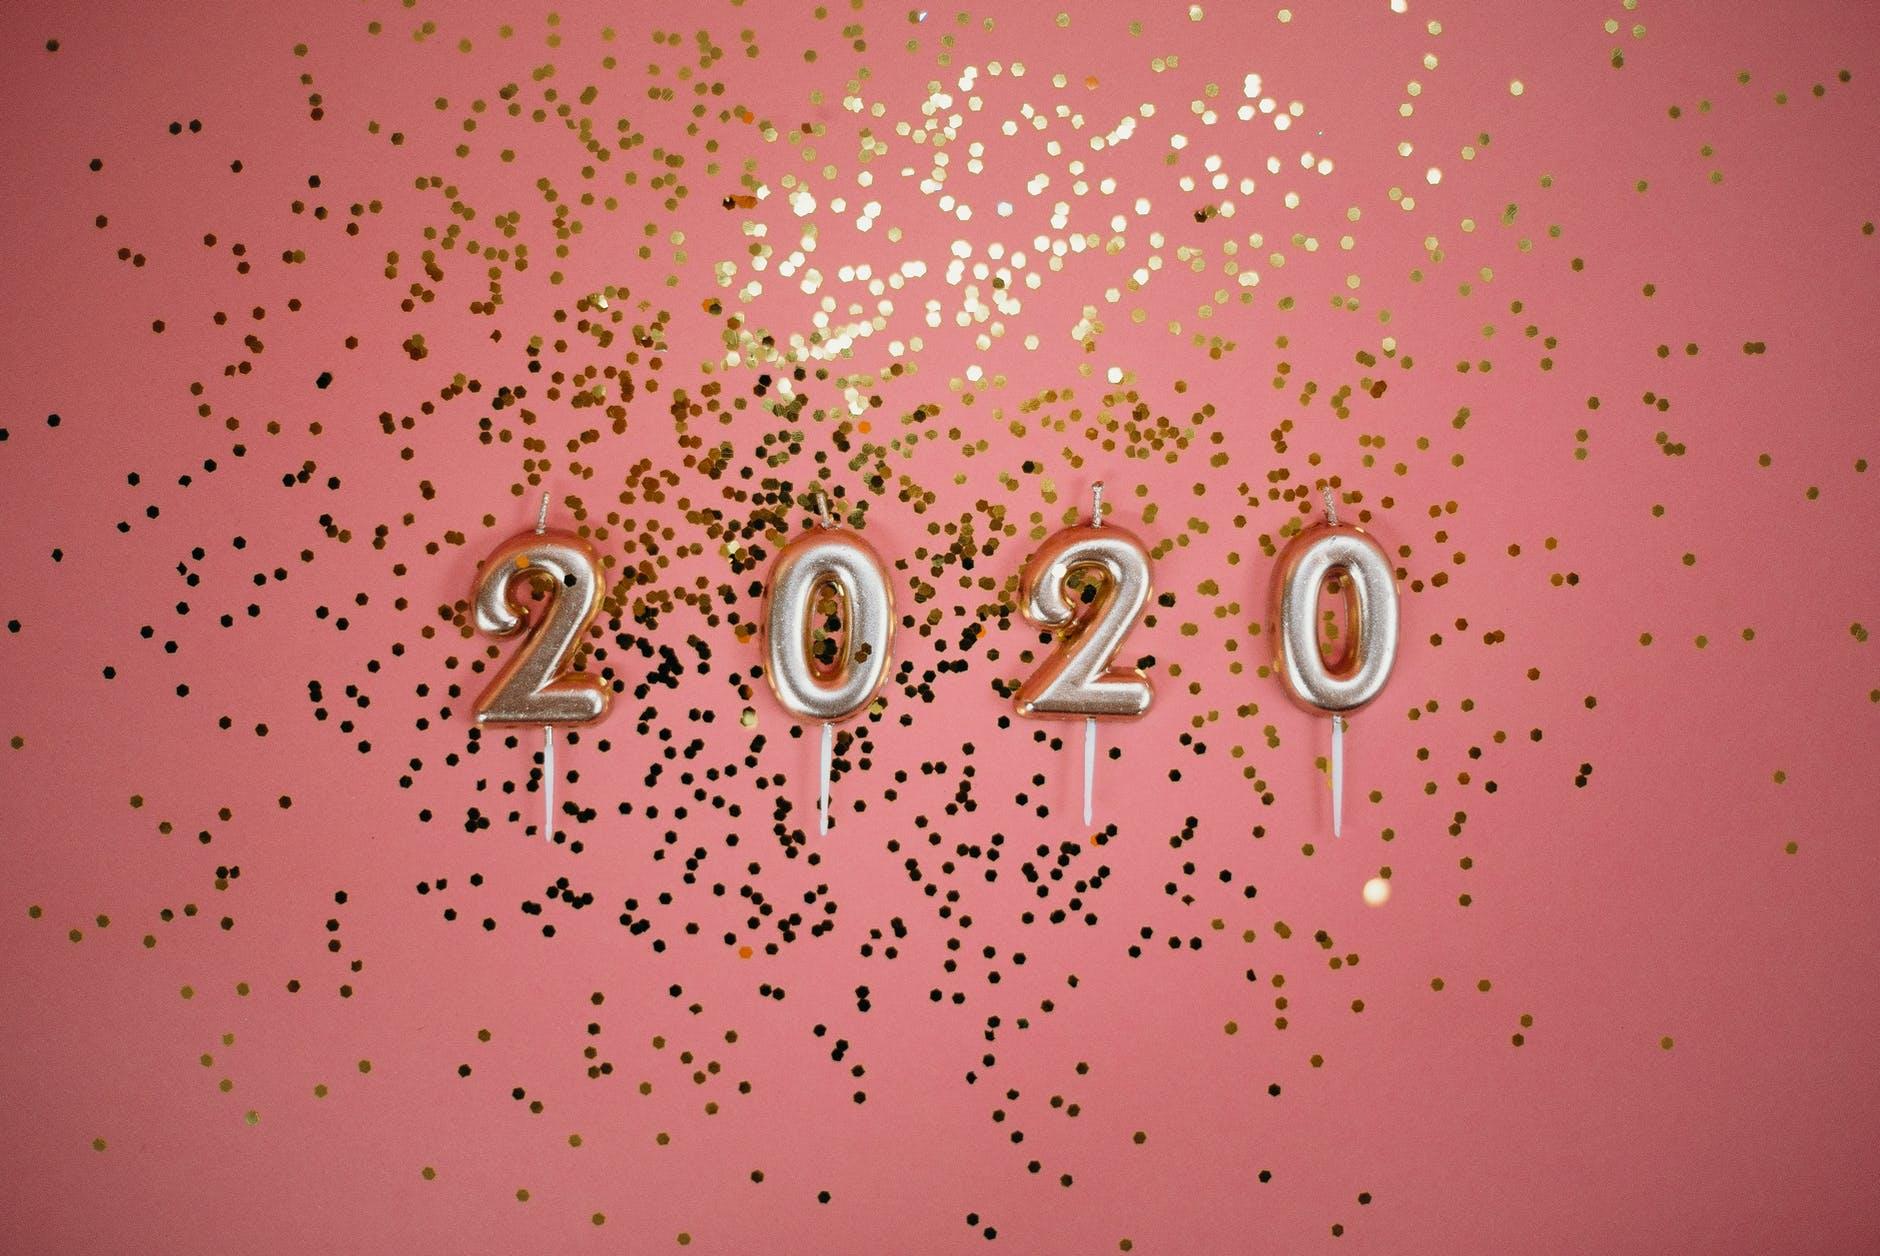 pexels-photo-3401900.jpeg tag fin d'année 2020